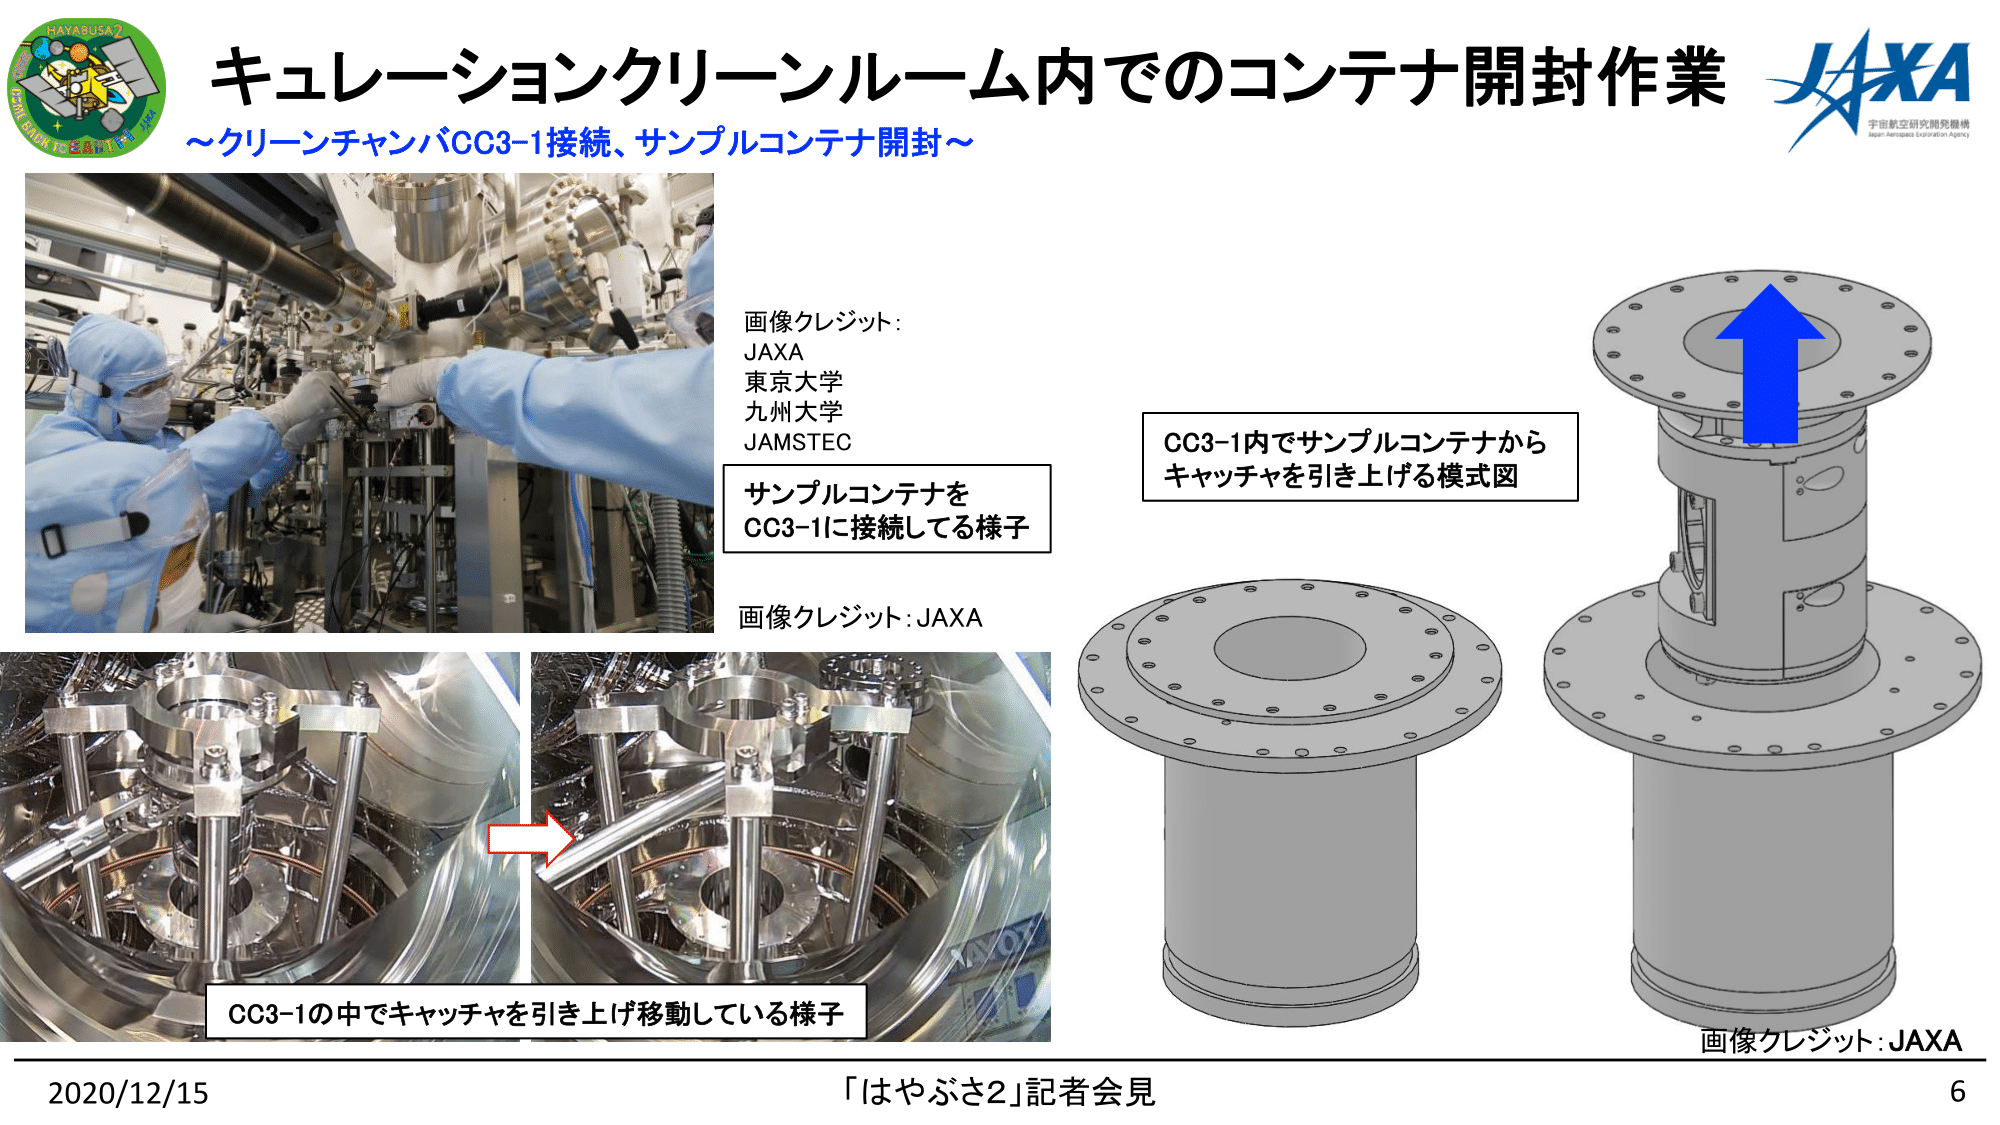 f:id:Imamura:20201224161604p:plain